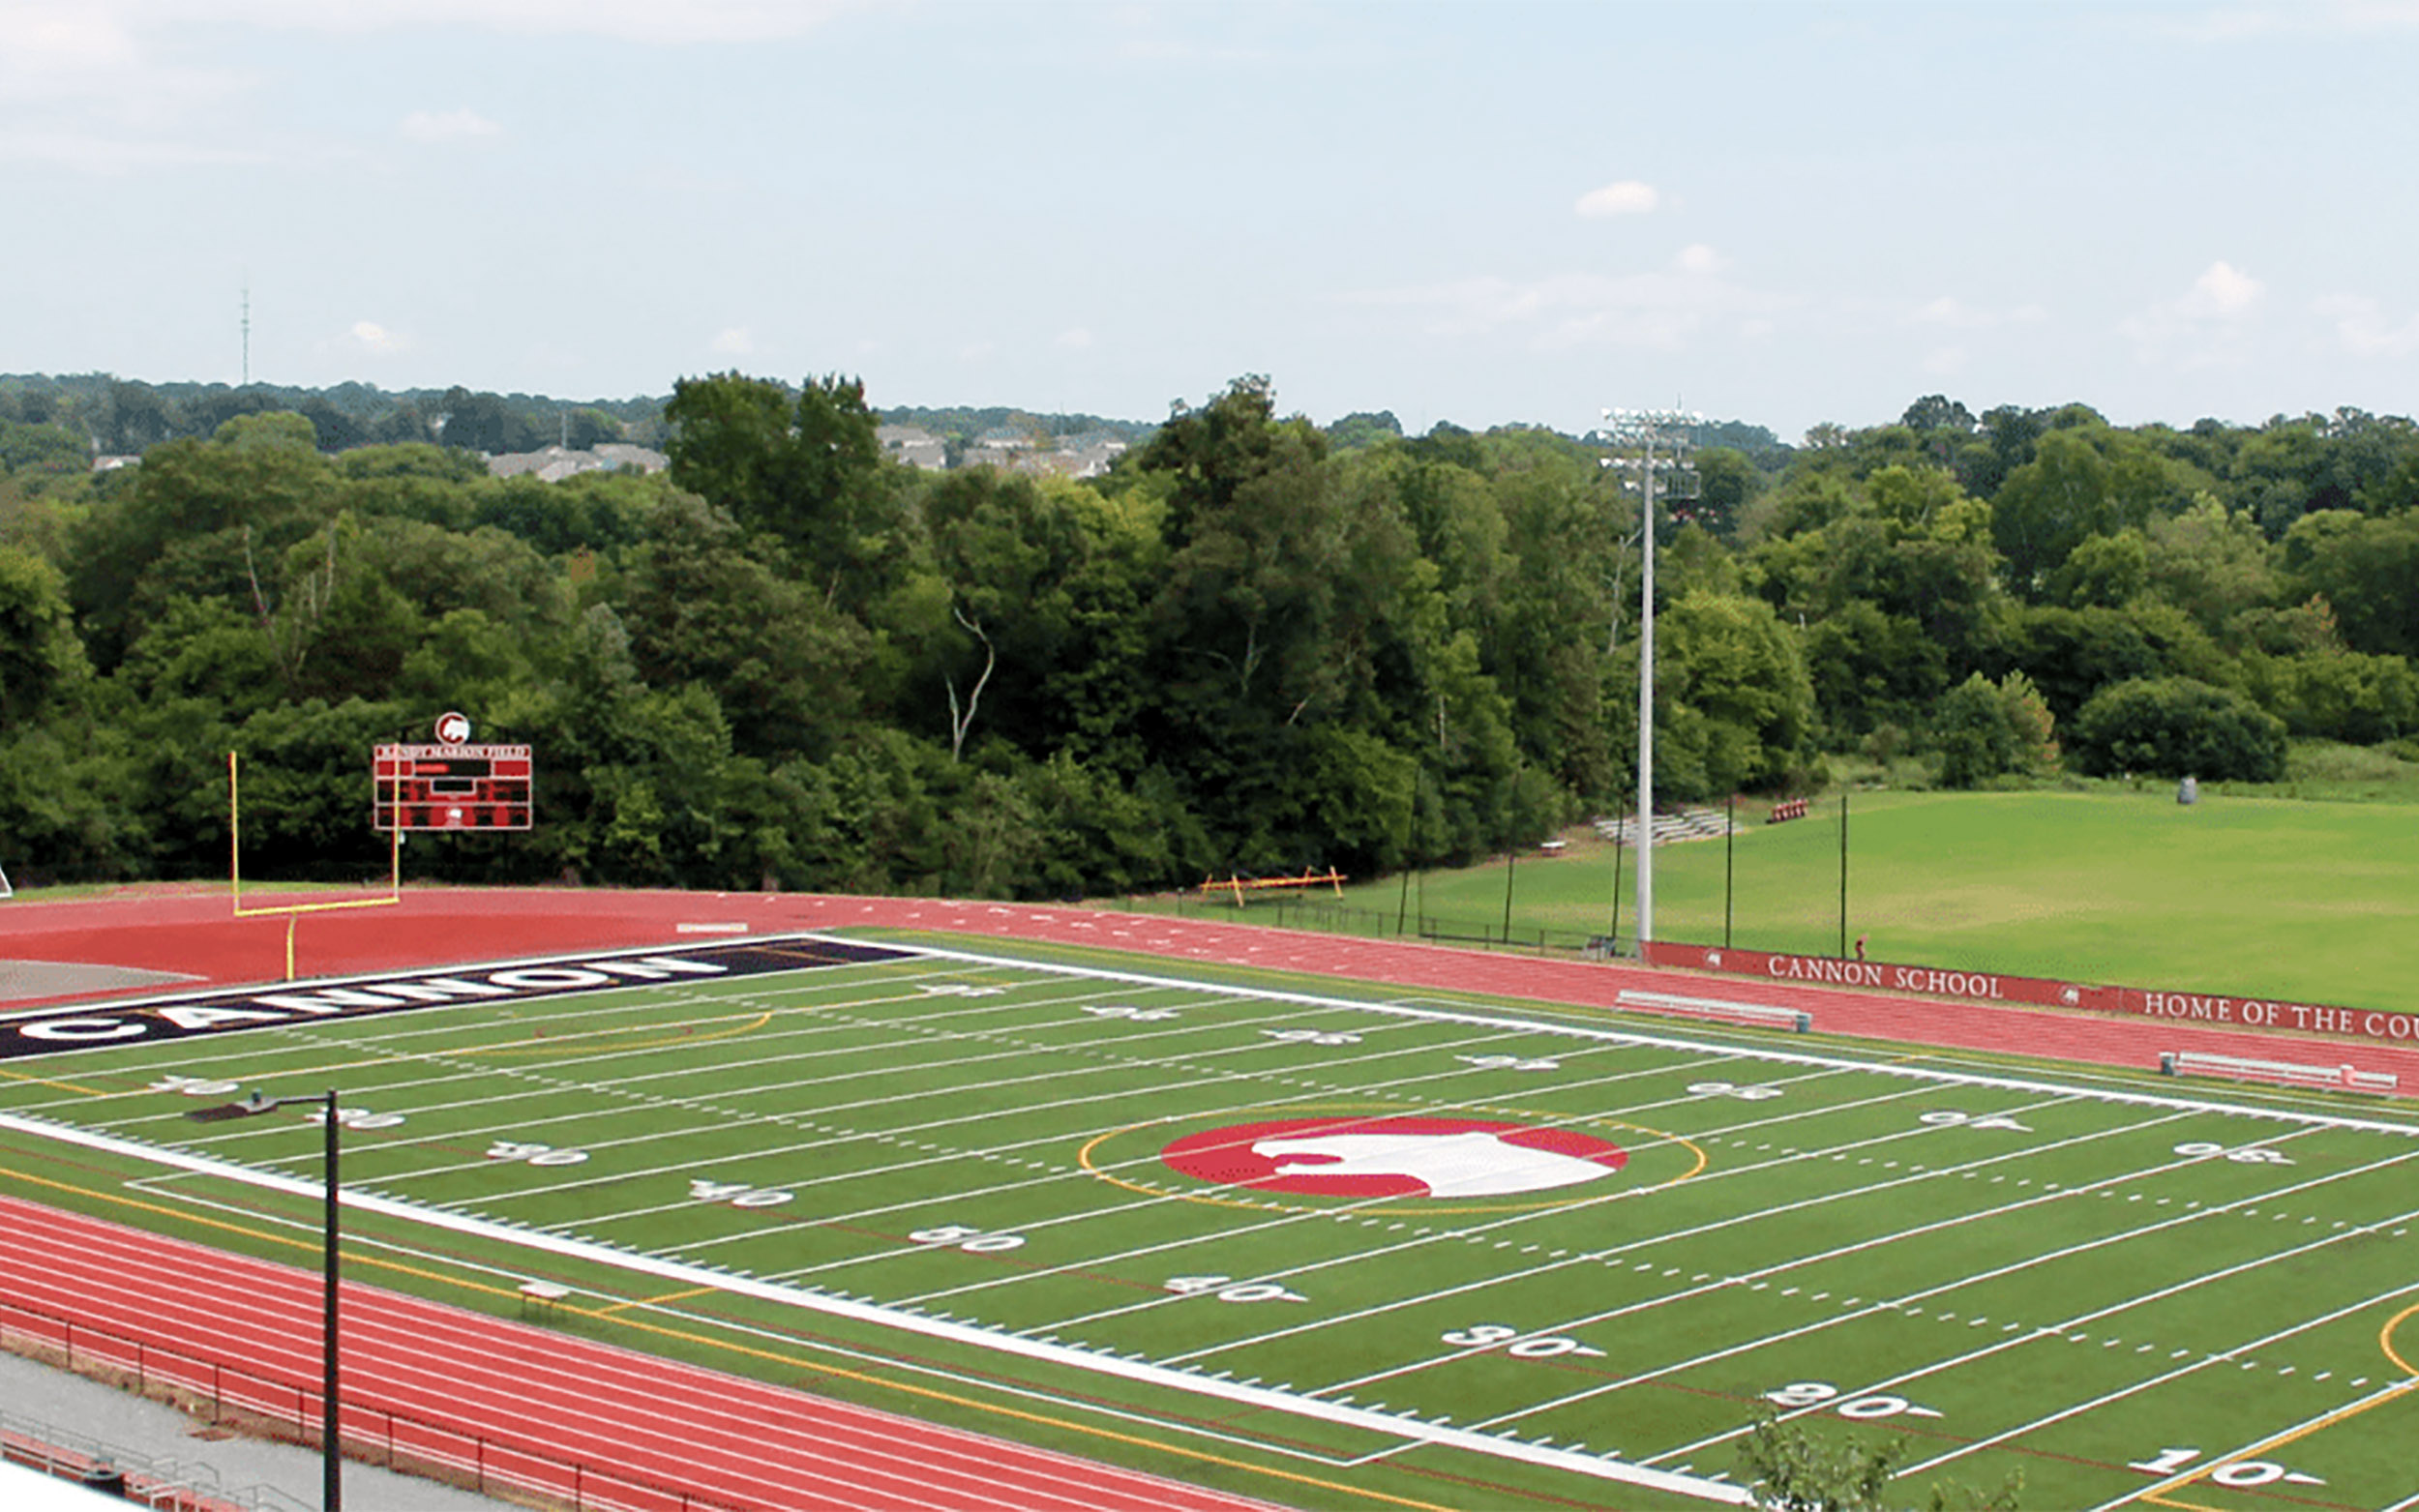 Cannon School Fieldhouse & Stadium